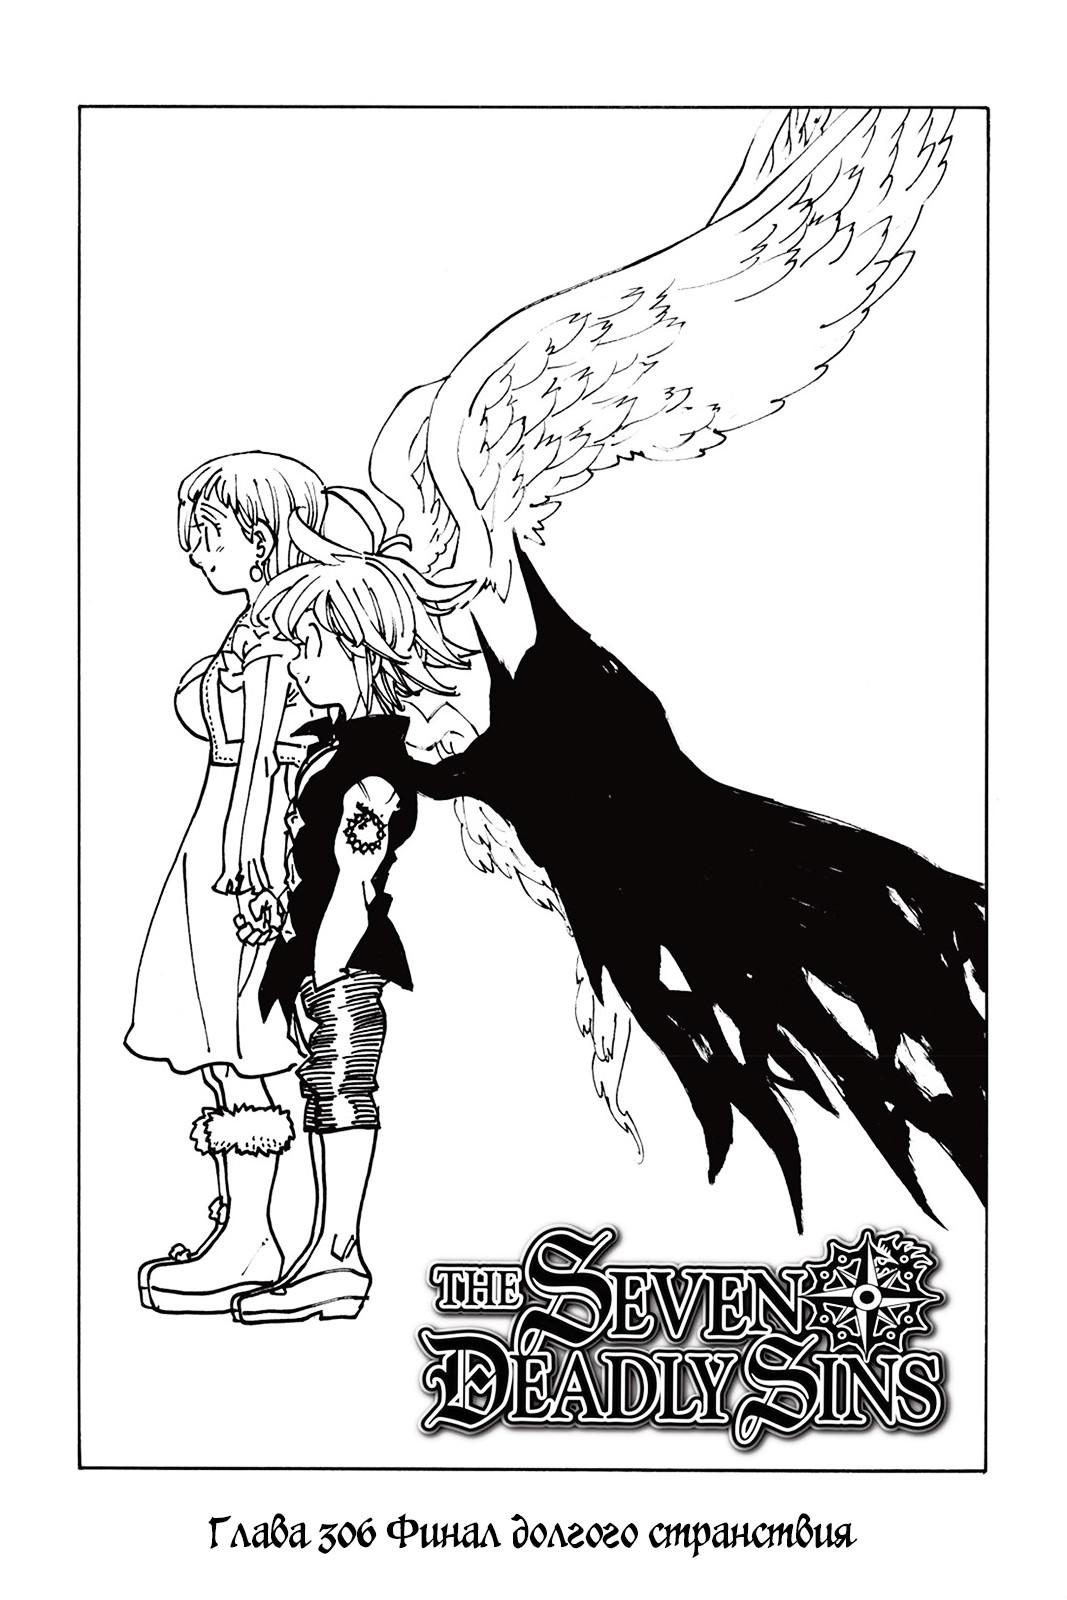 https://r1.ninemanga.com/comics/pic3/29/22109/1330792/1554632675952.jpg Page 1